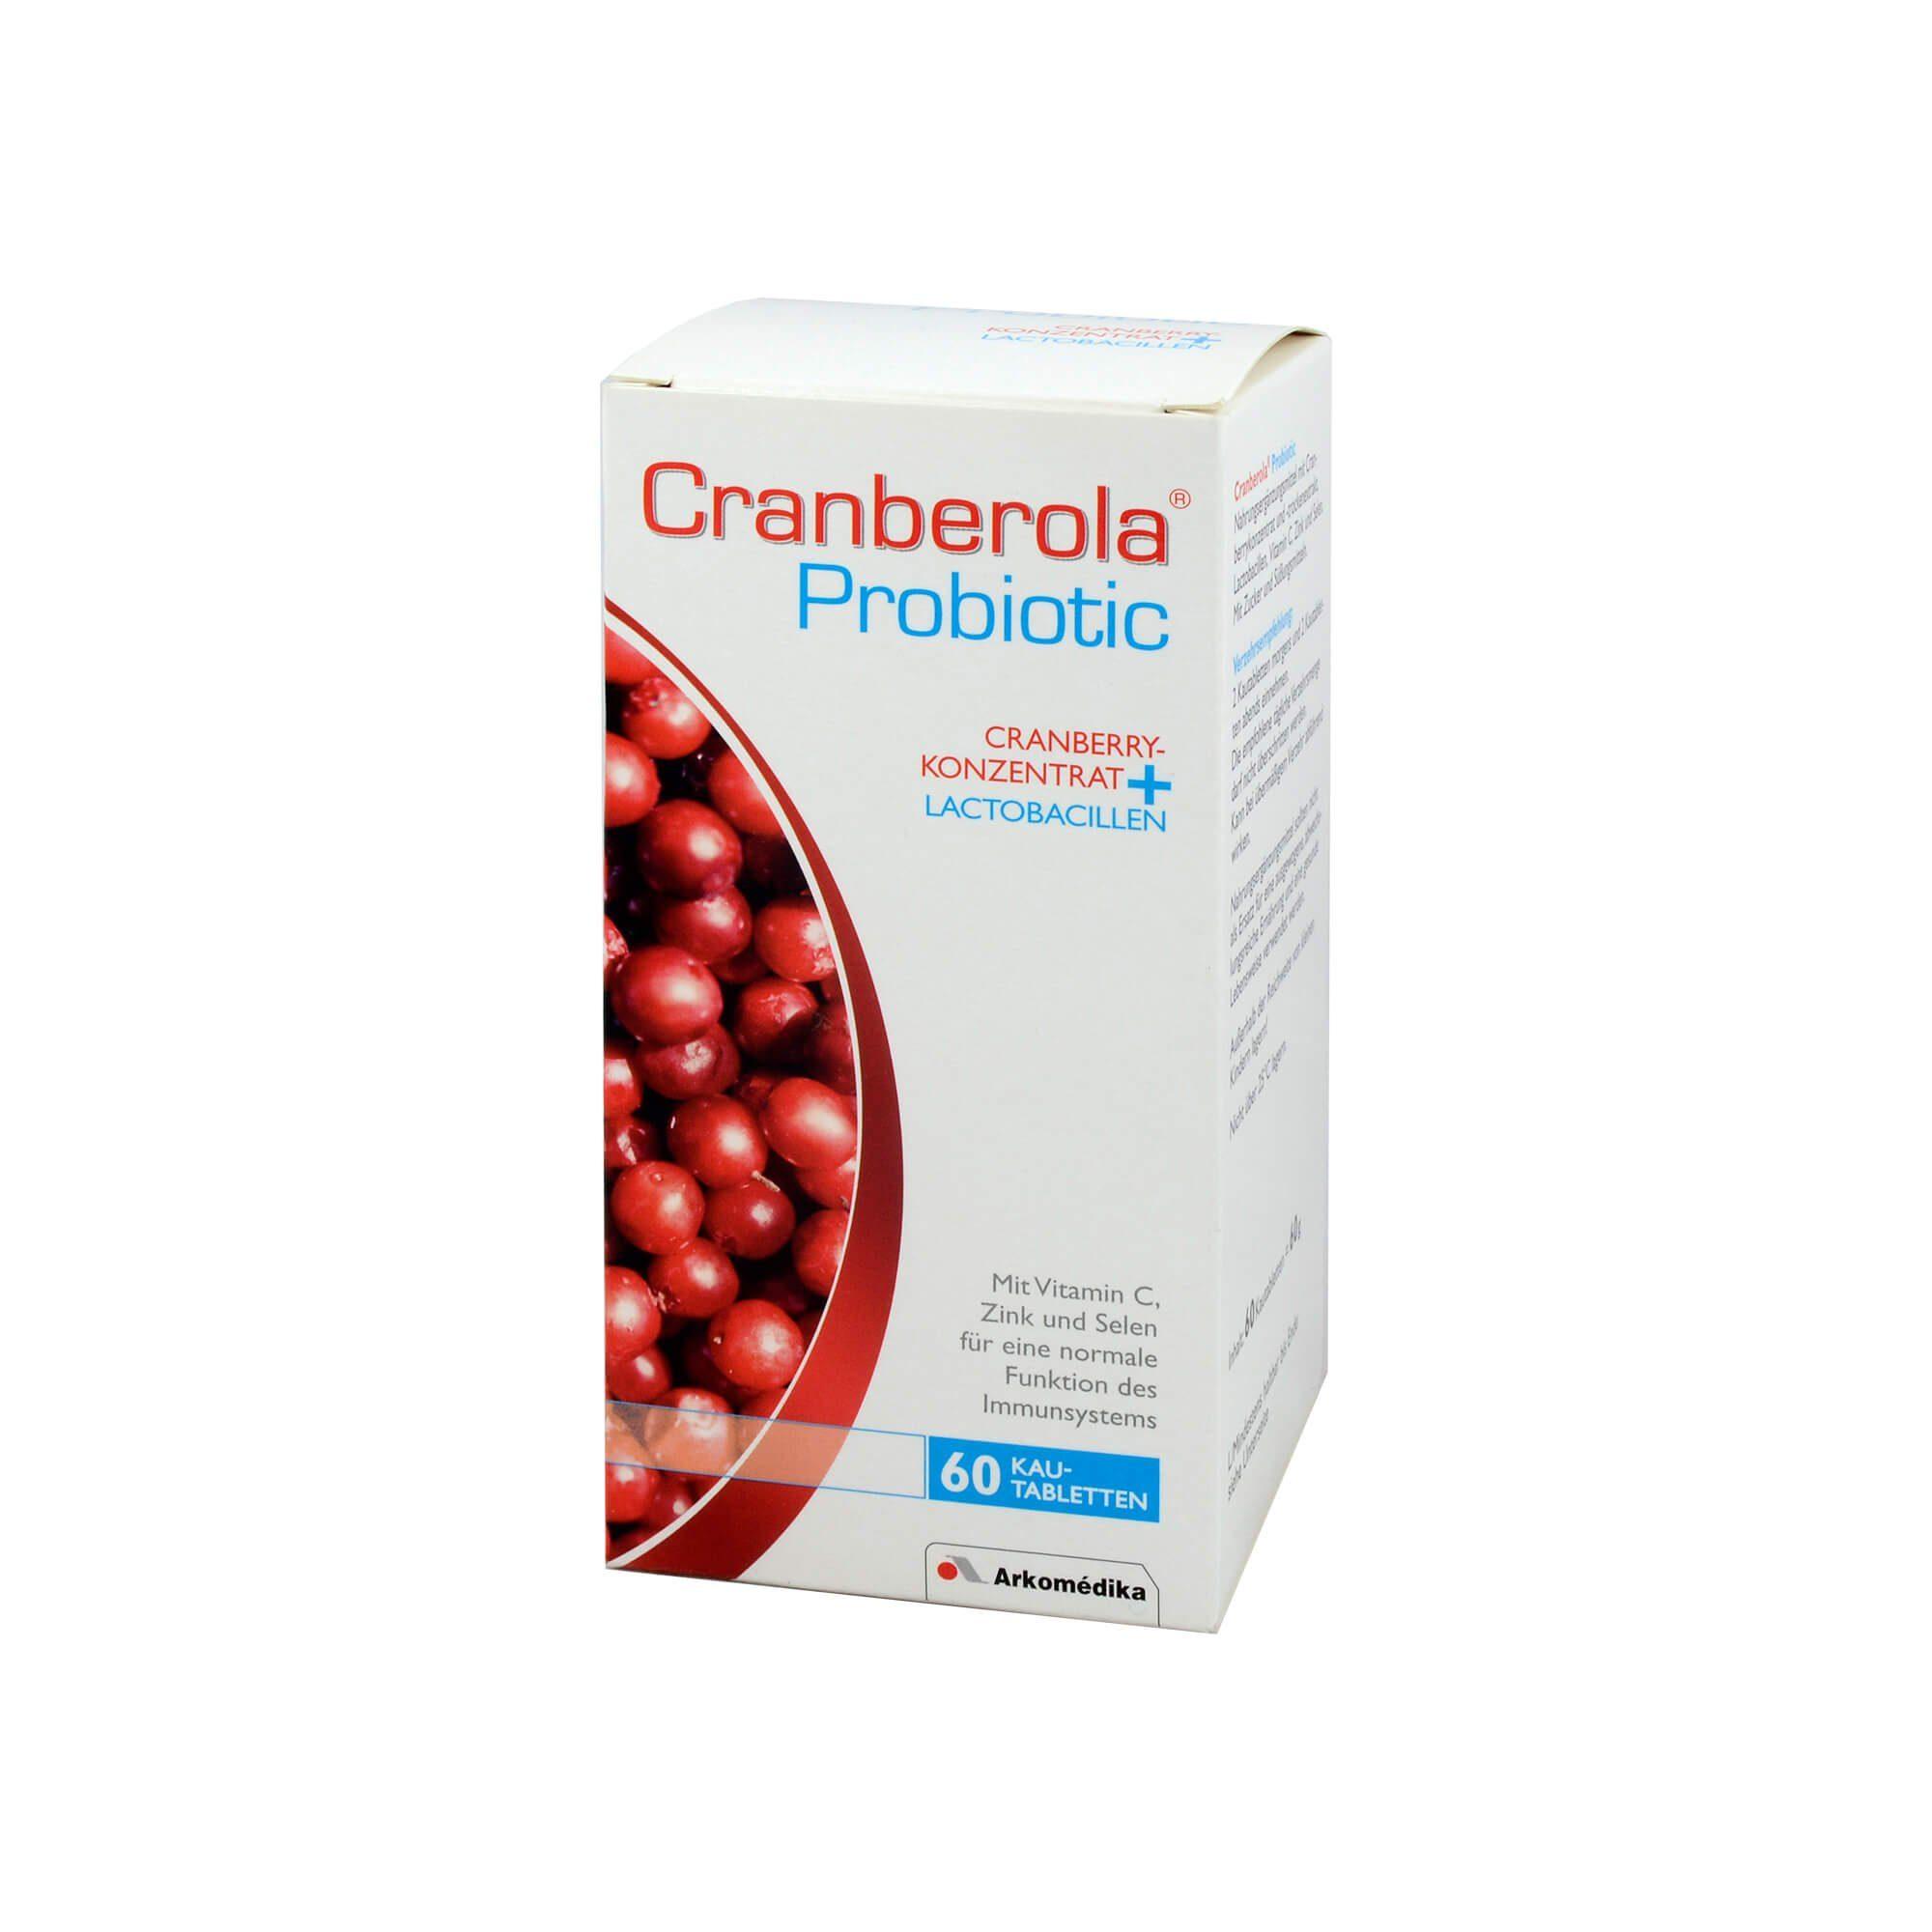 Cranberola Probiotic Kautabletten , 60 St